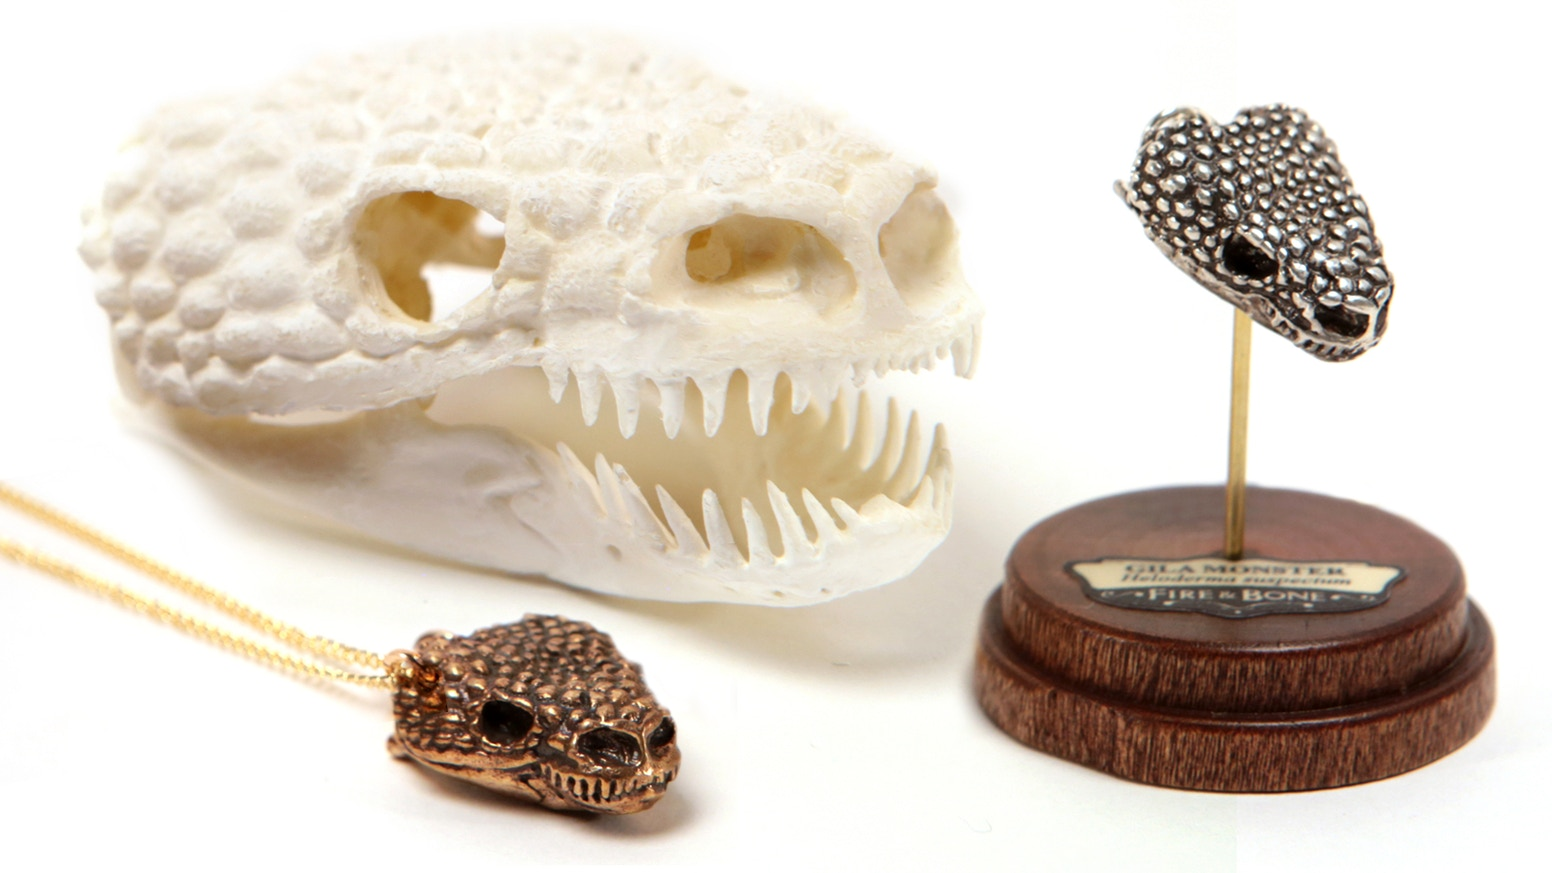 FIRE & BONE 5: Tiny, Digitally Captured, Metal Animal Skulls